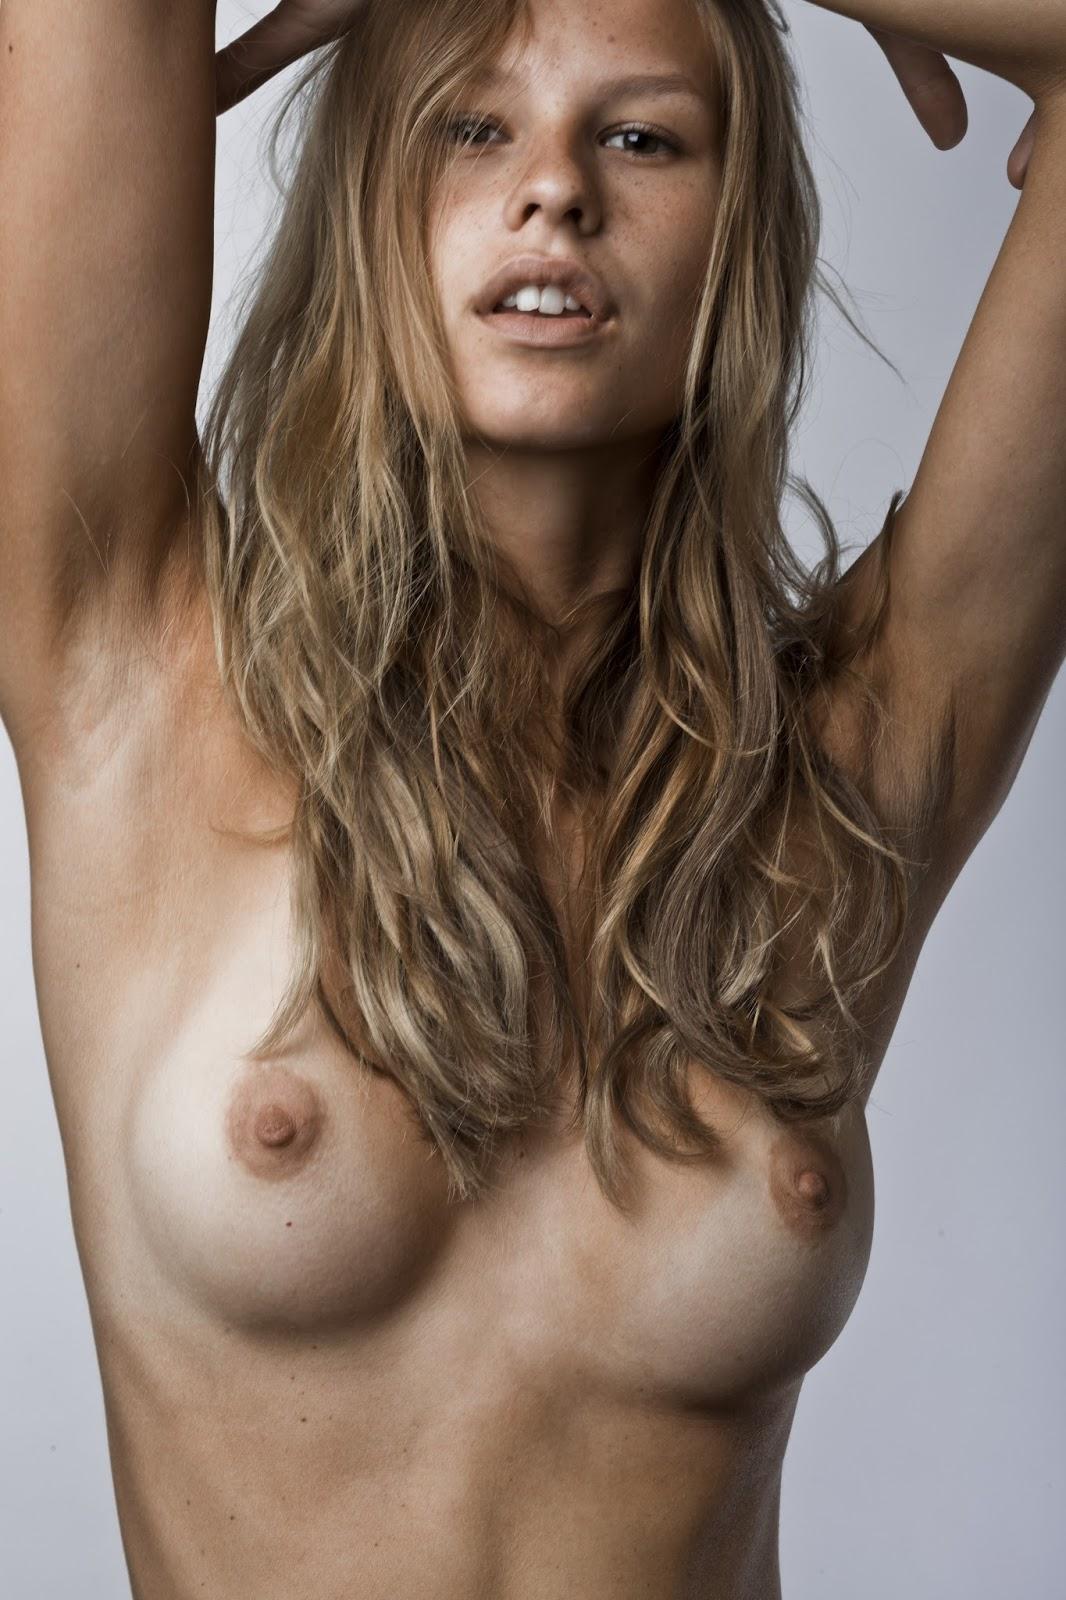 Barbara nordin nude in orgy of the dead - 2 4